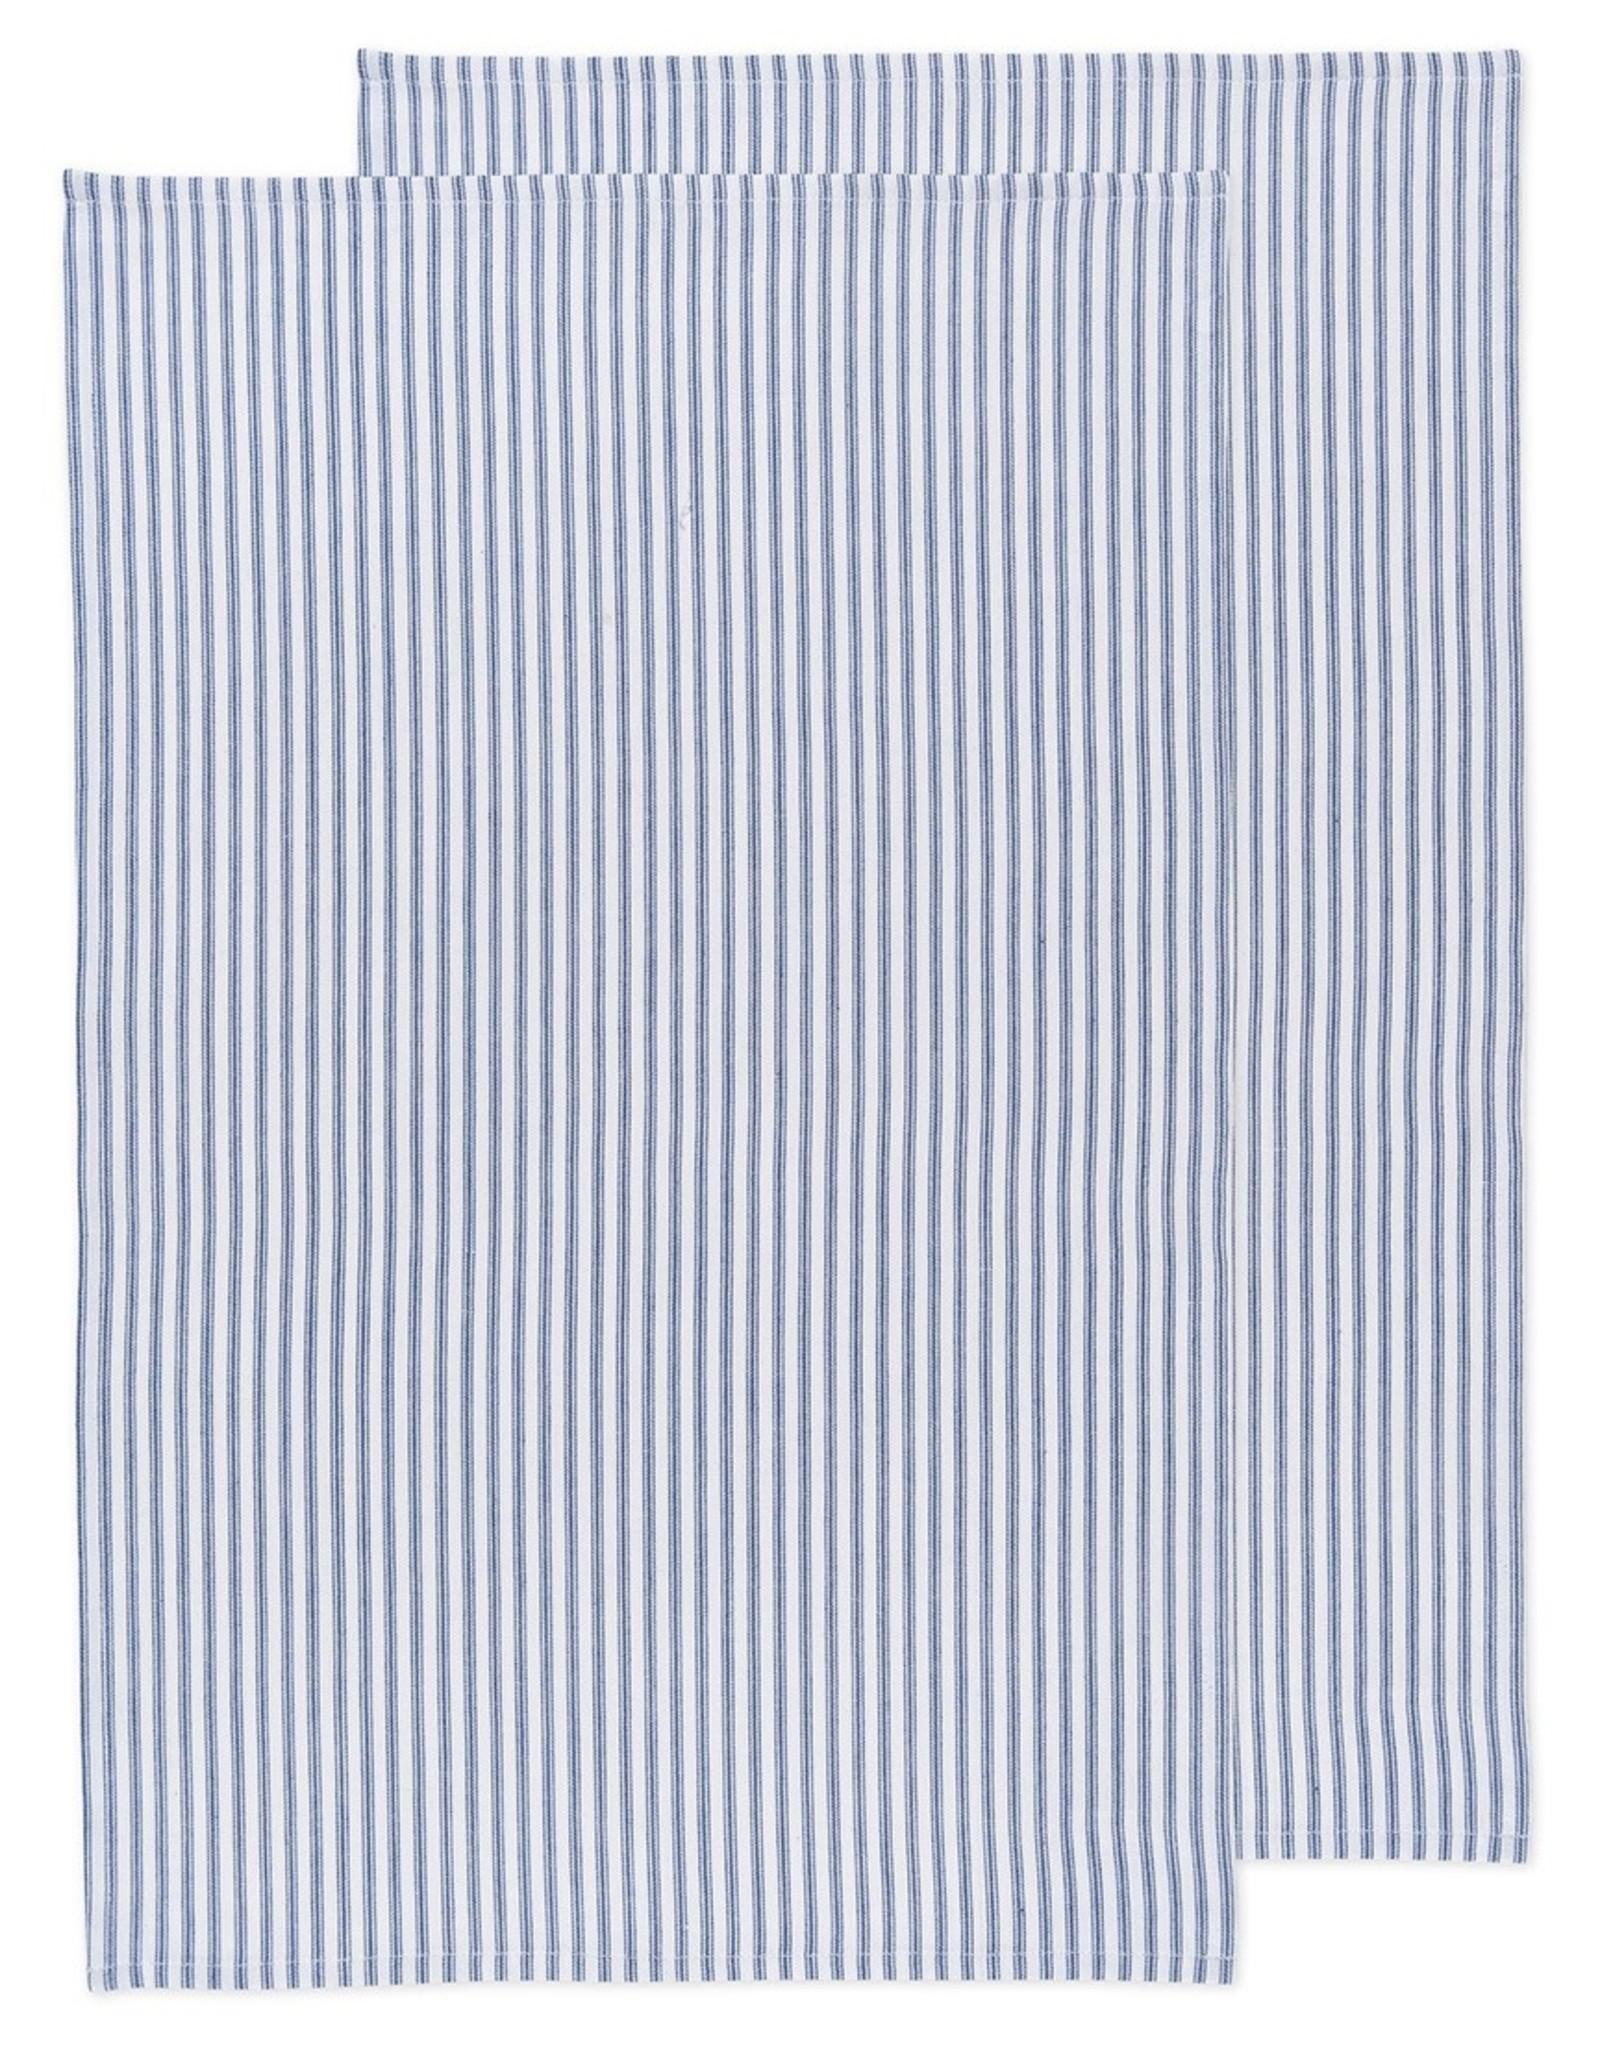 Glass Towel - Set of 2